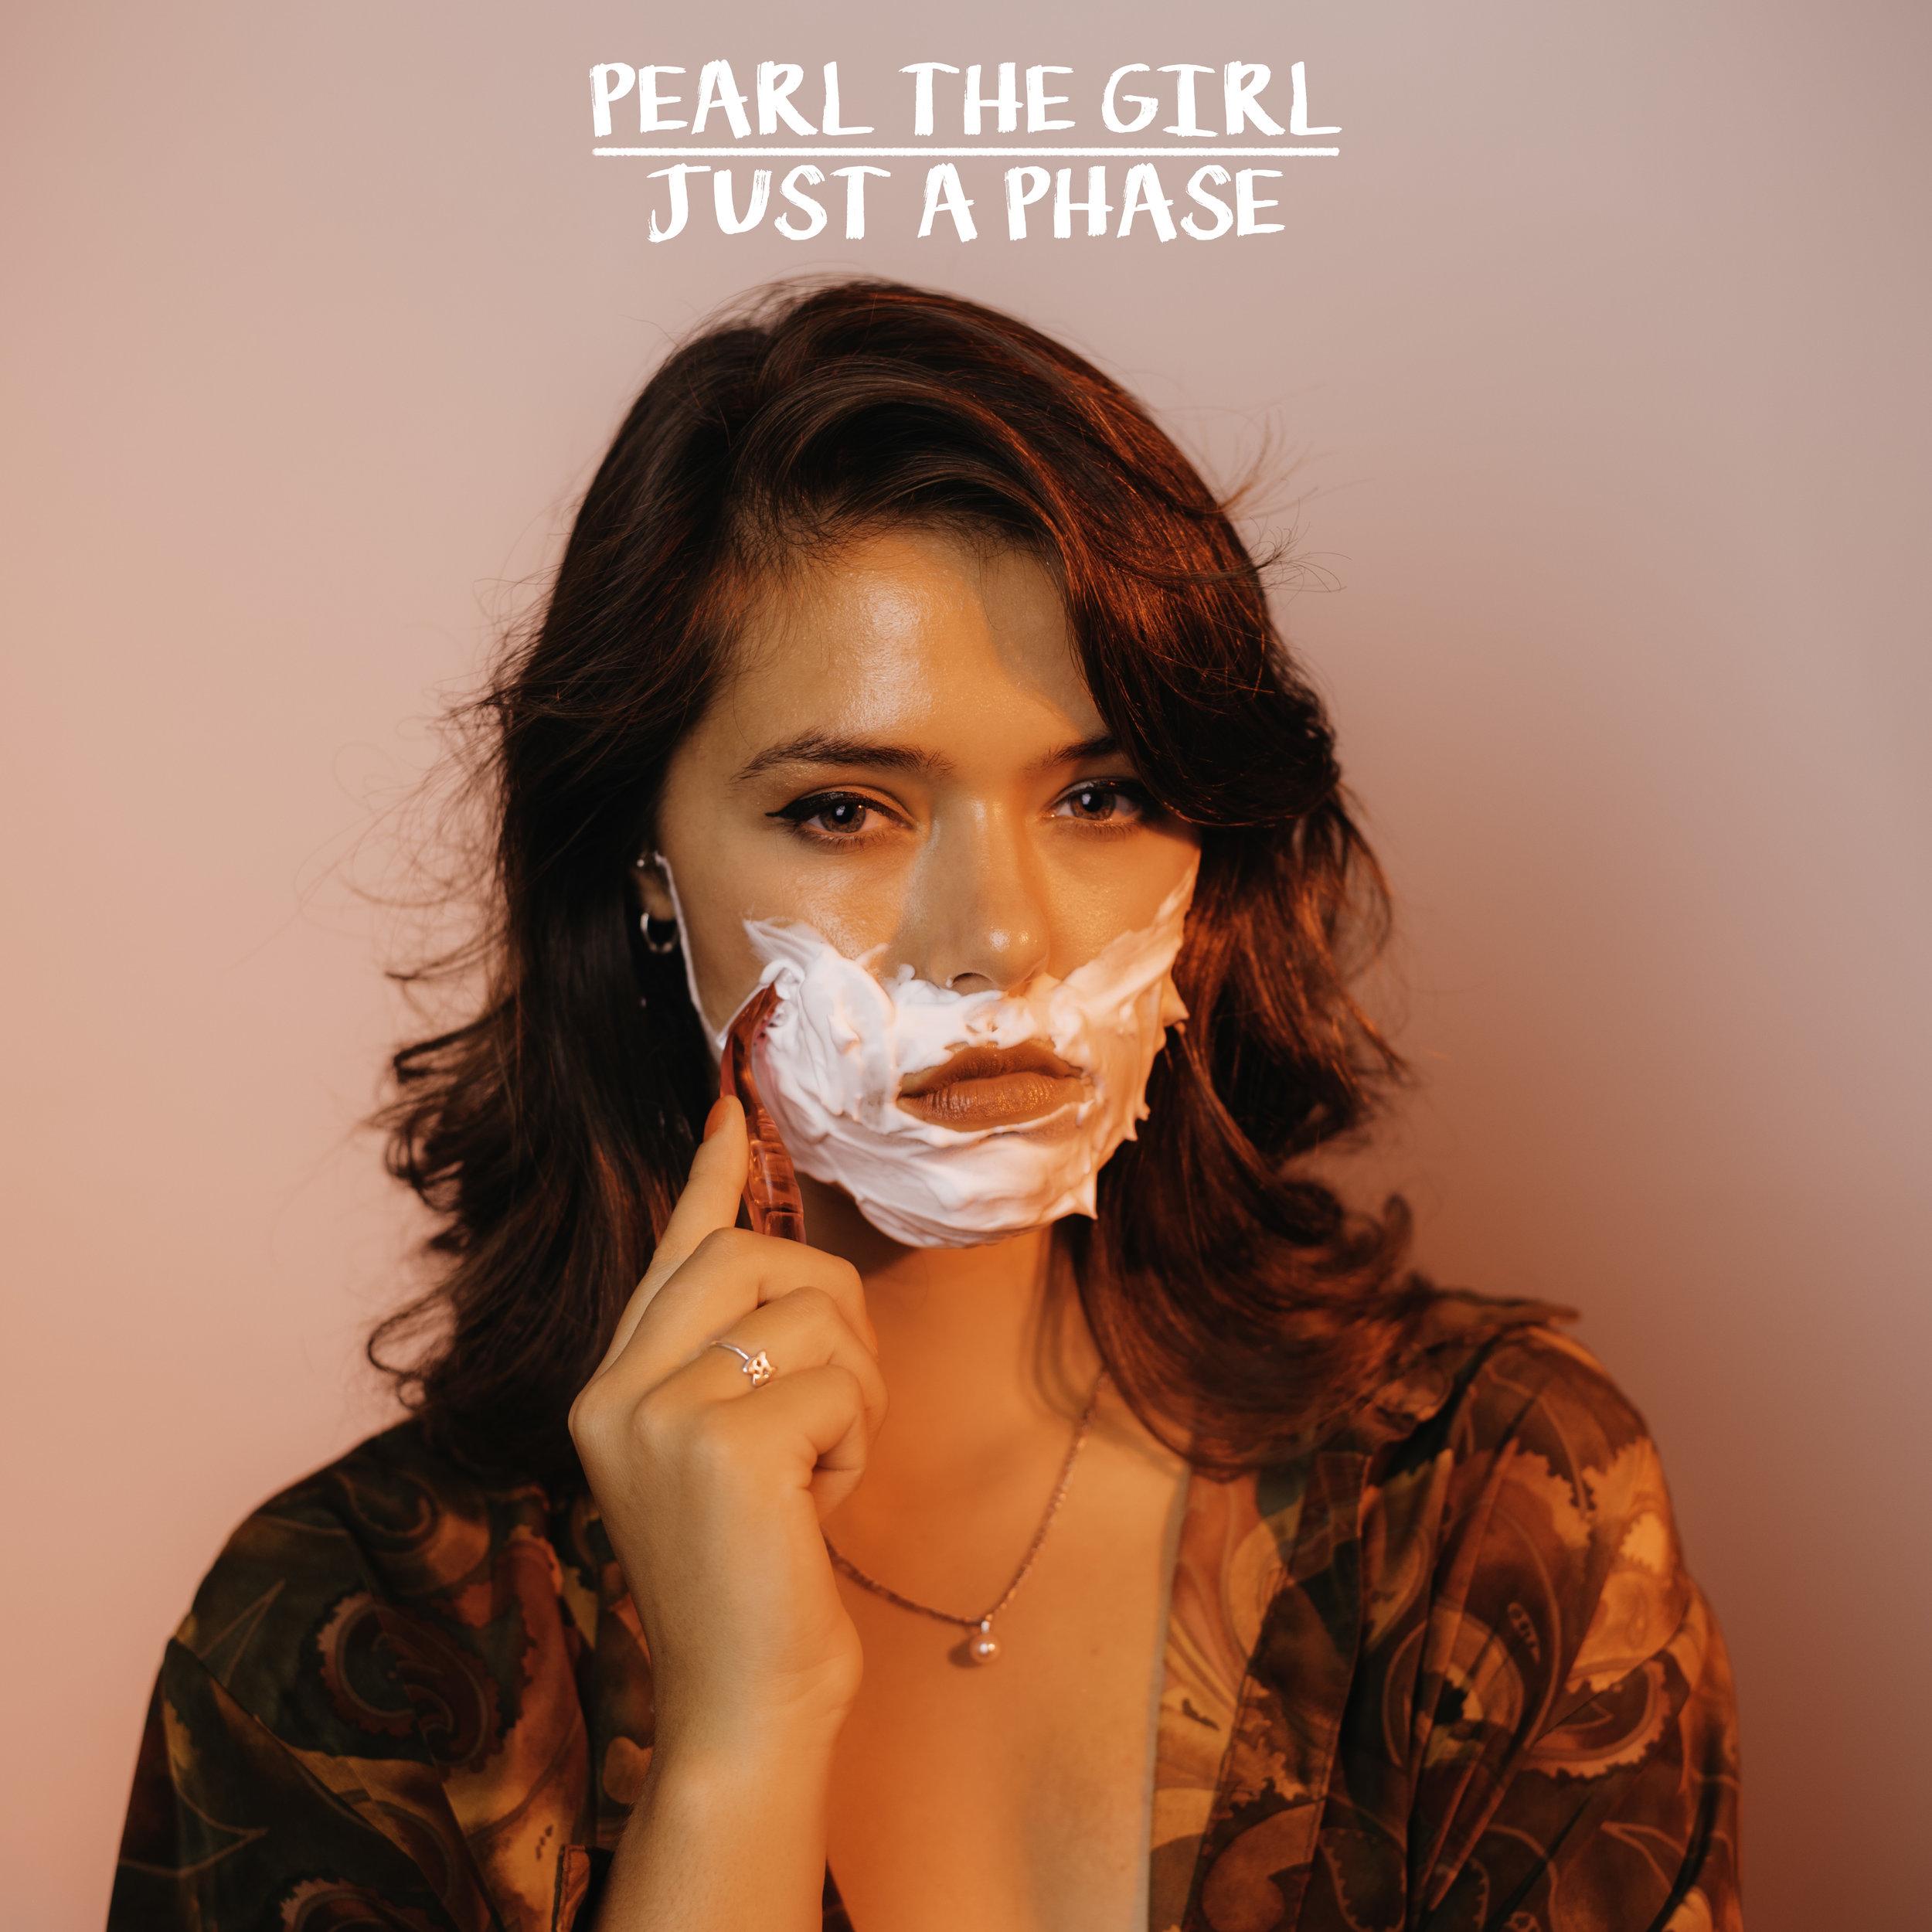 PearlTheGirl-JustAPhase-Square.jpg